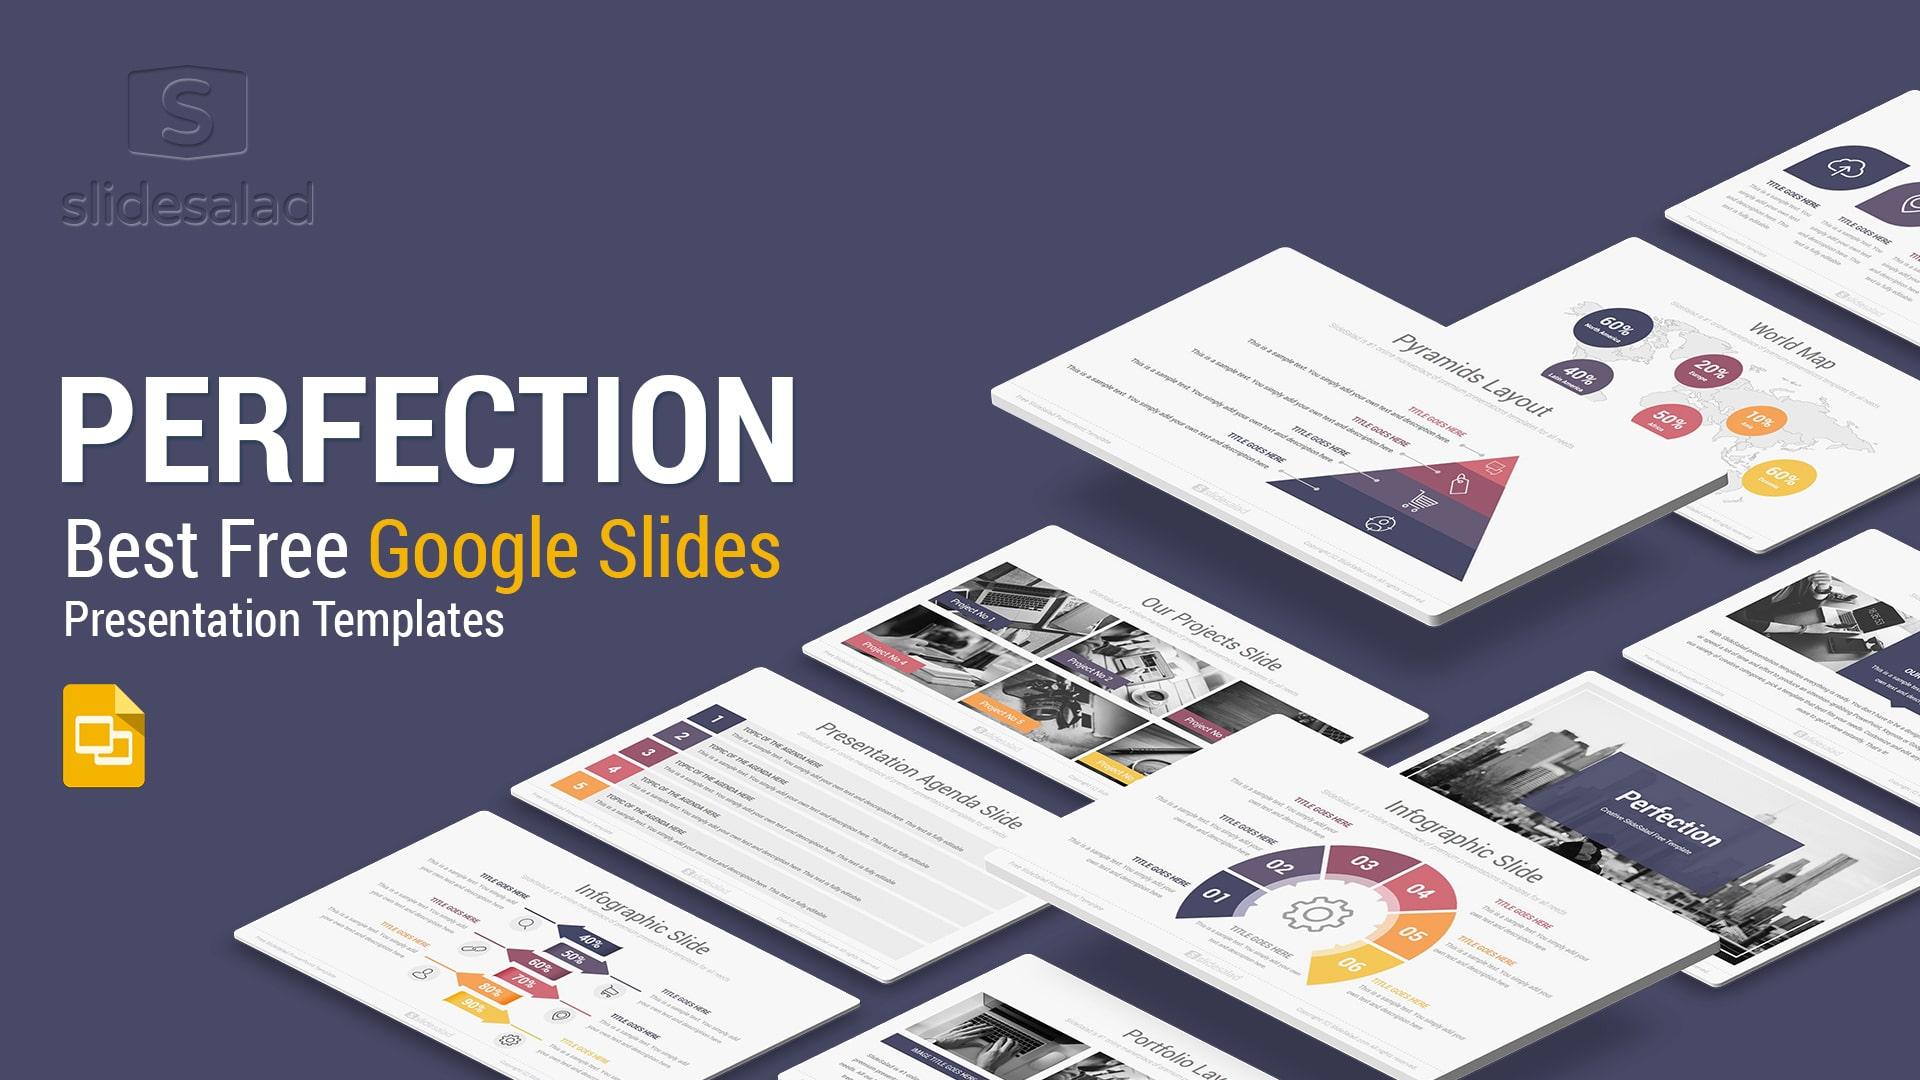 Perfection Best Free Google Slides Presentation Themes Templates